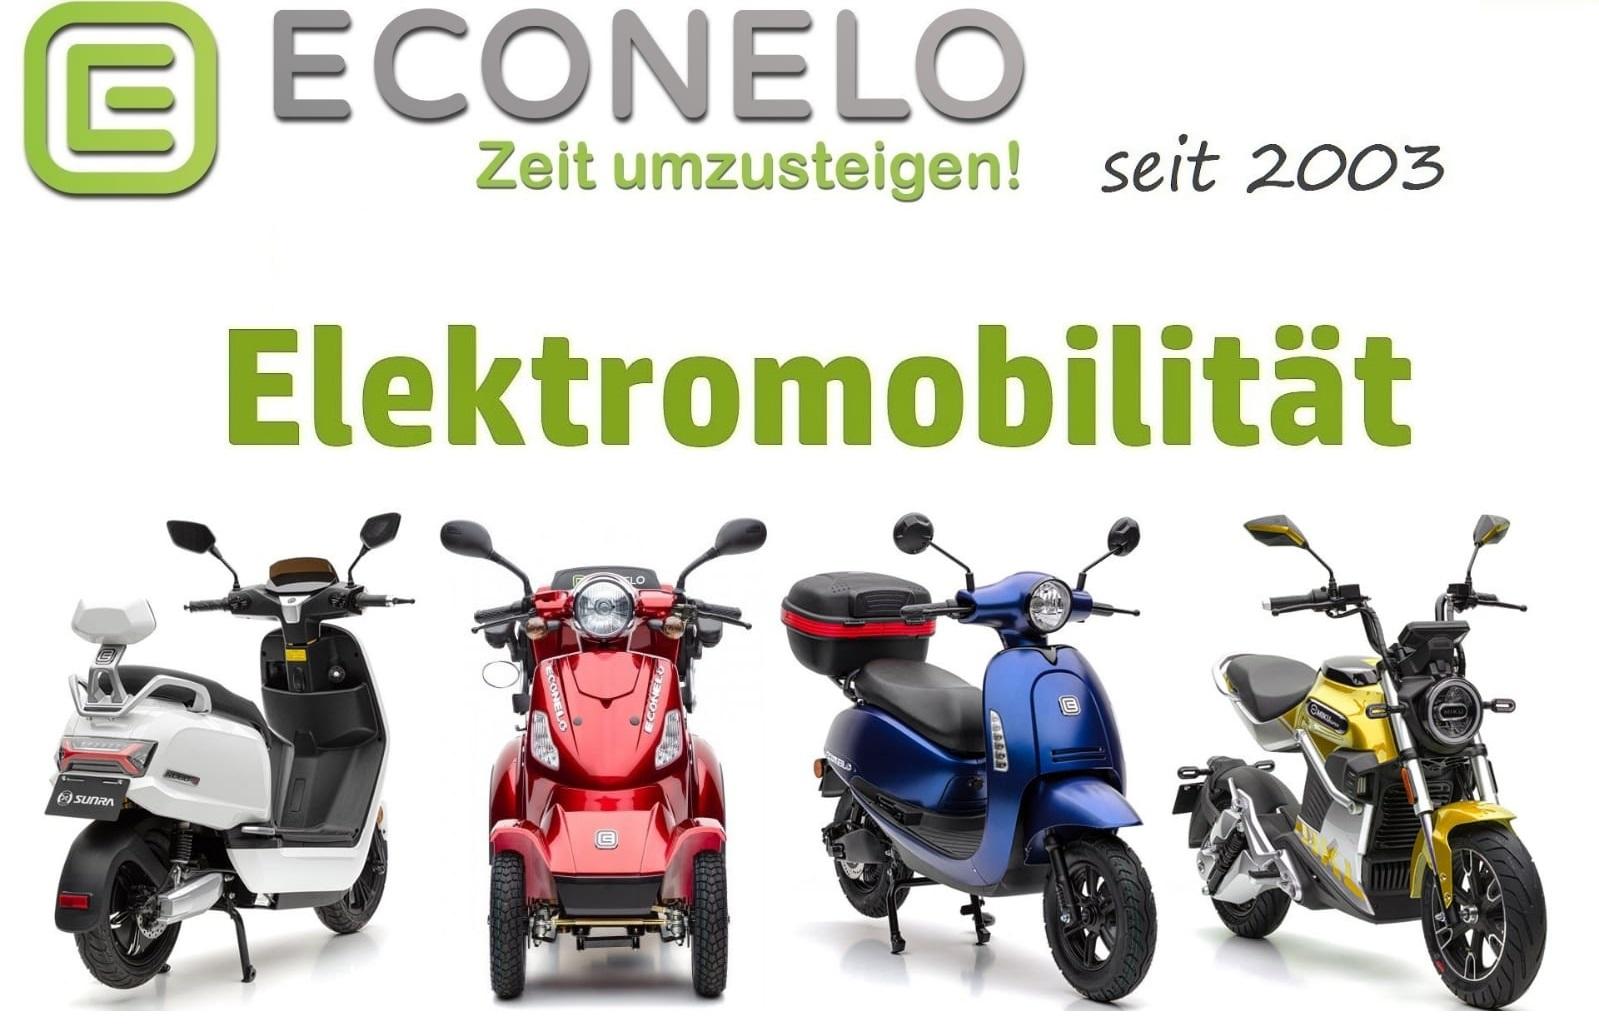 Econelo Elektromobile E-Zweirad E-Vierrad